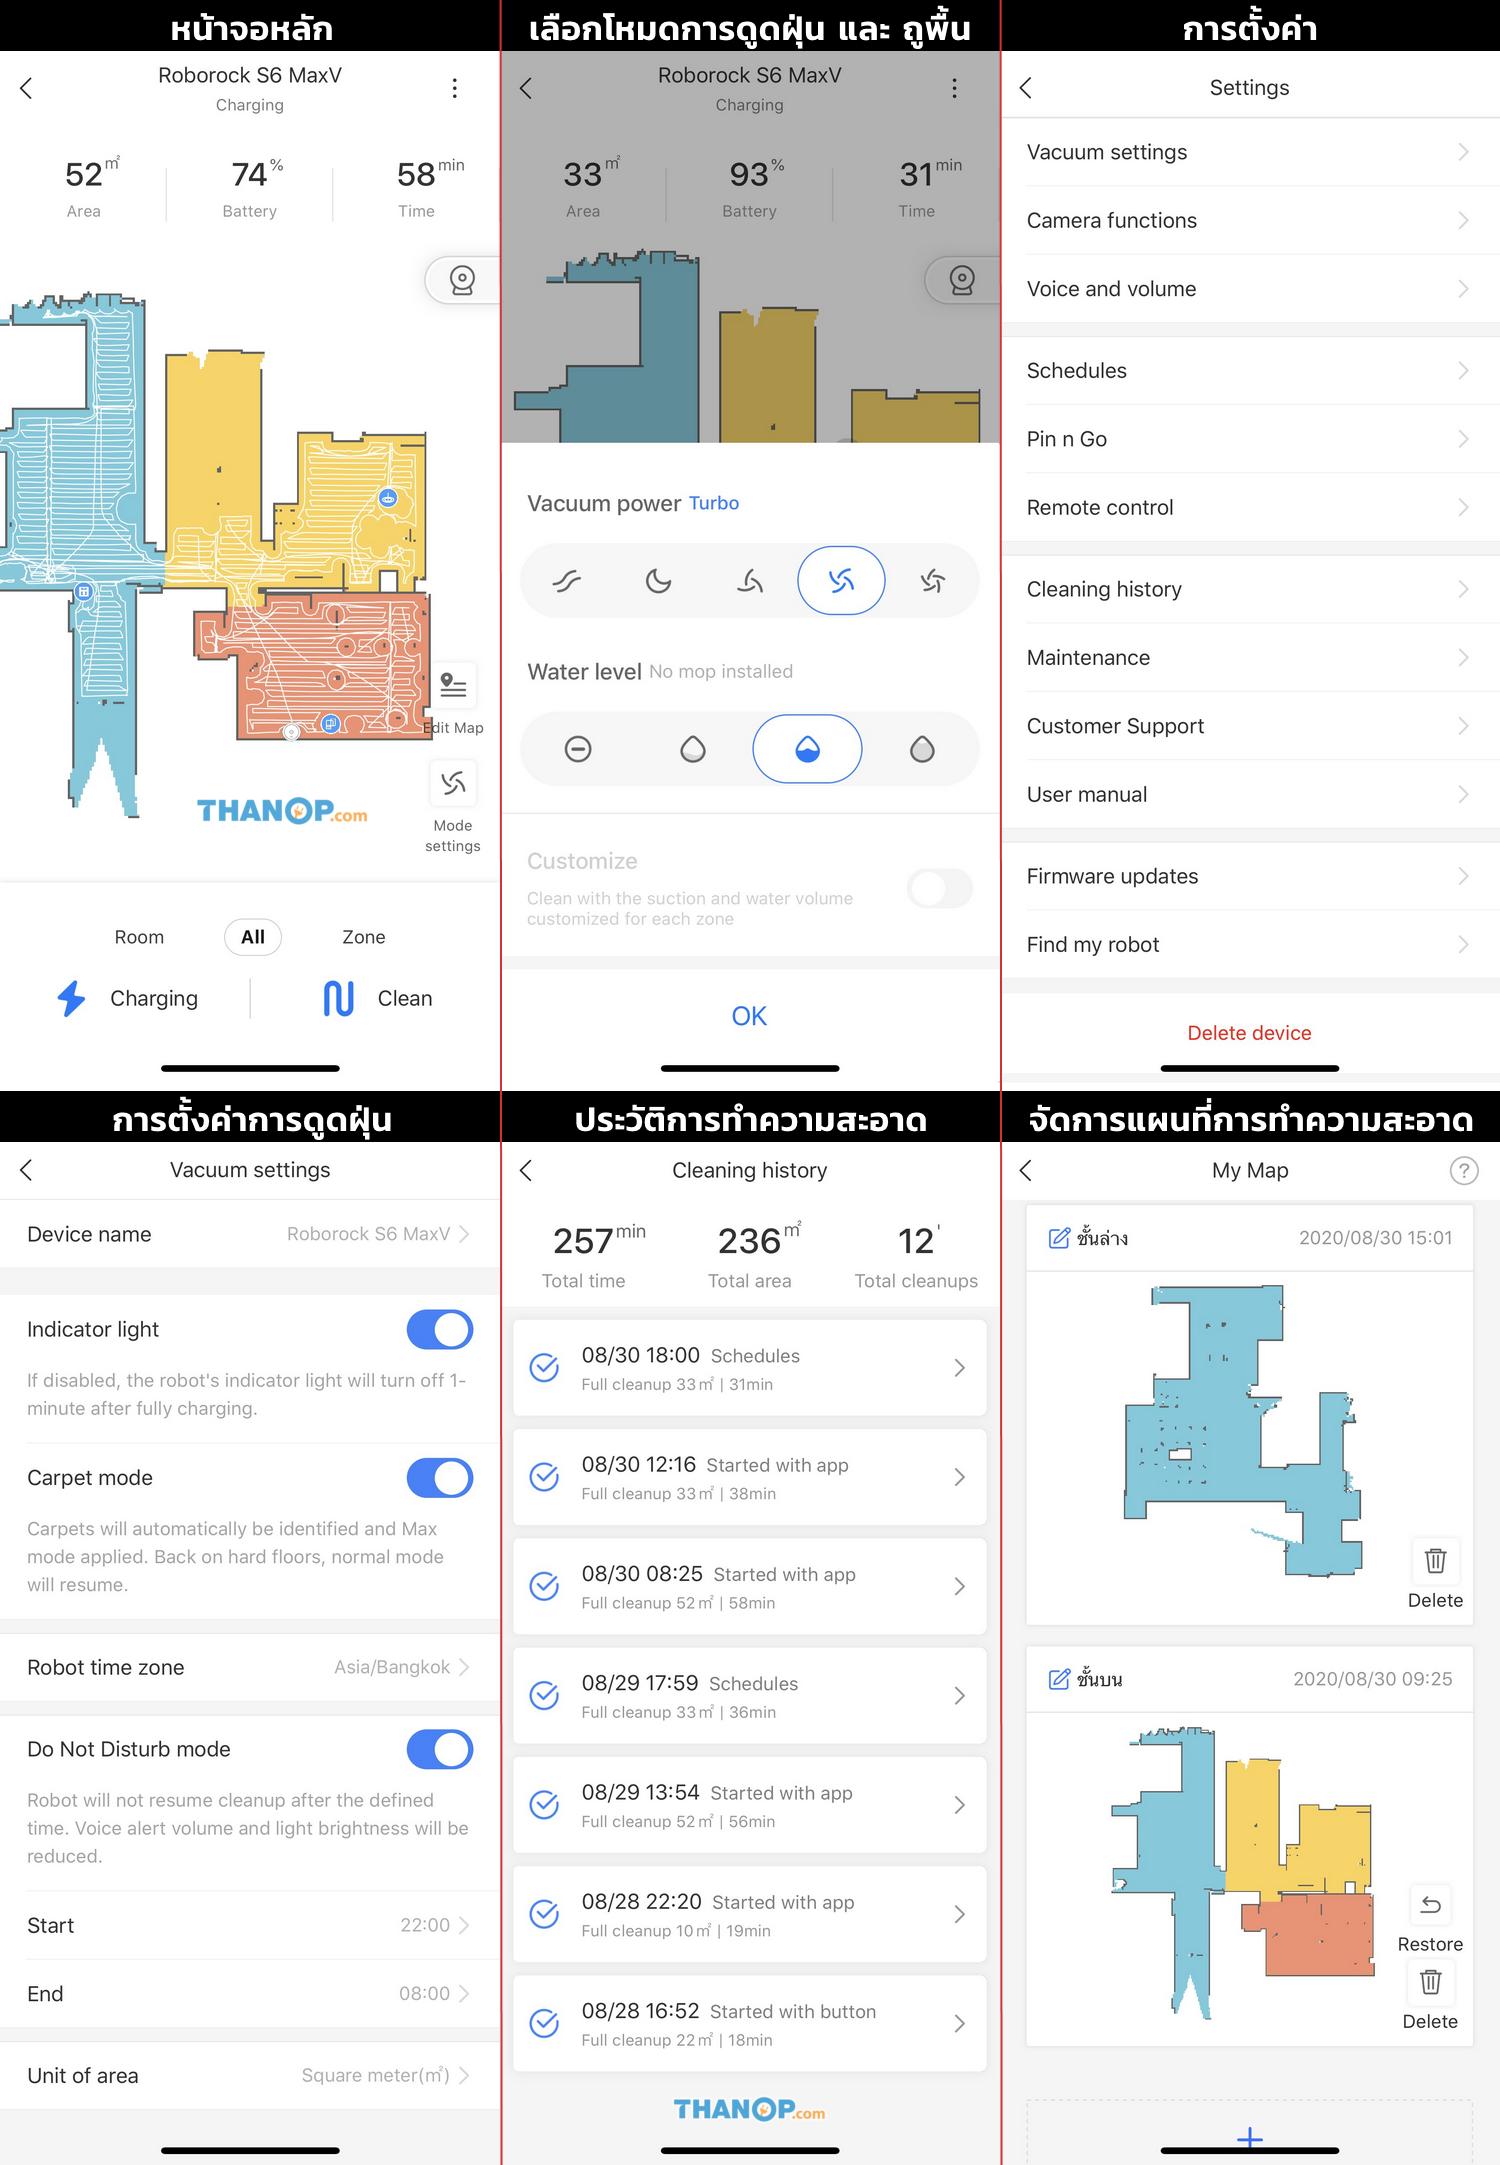 roborock-app-interface-general-example